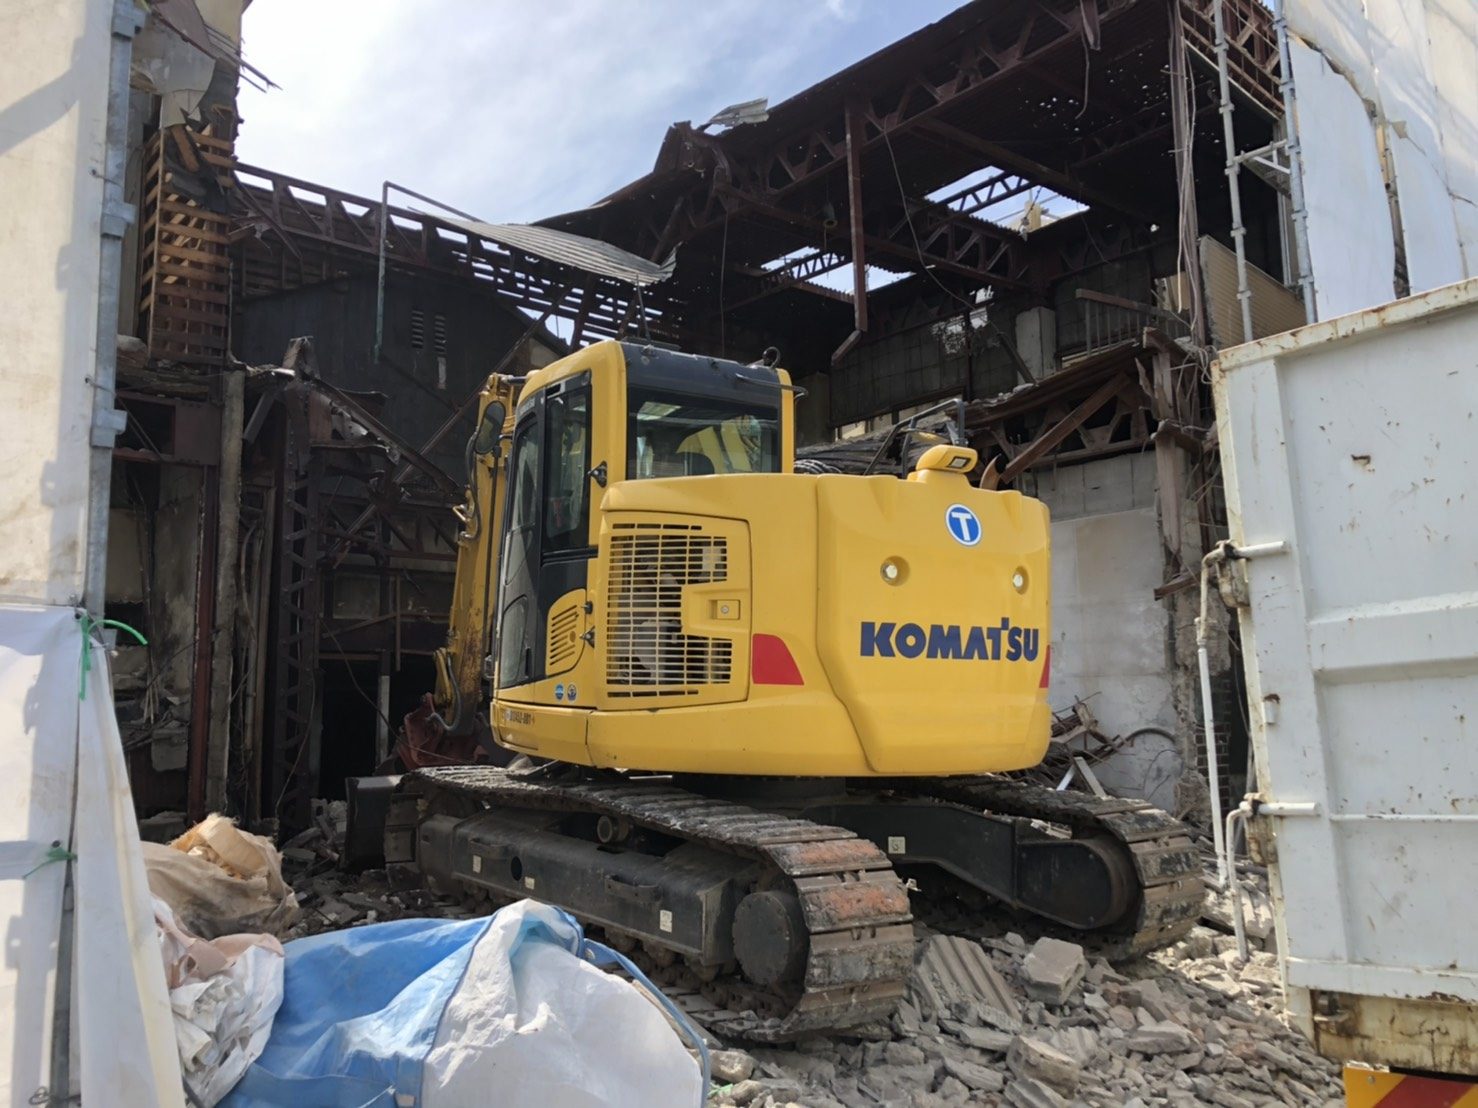 岡山市 三階建て鉄骨ブロック造解体・木造1部解体、庭撤去